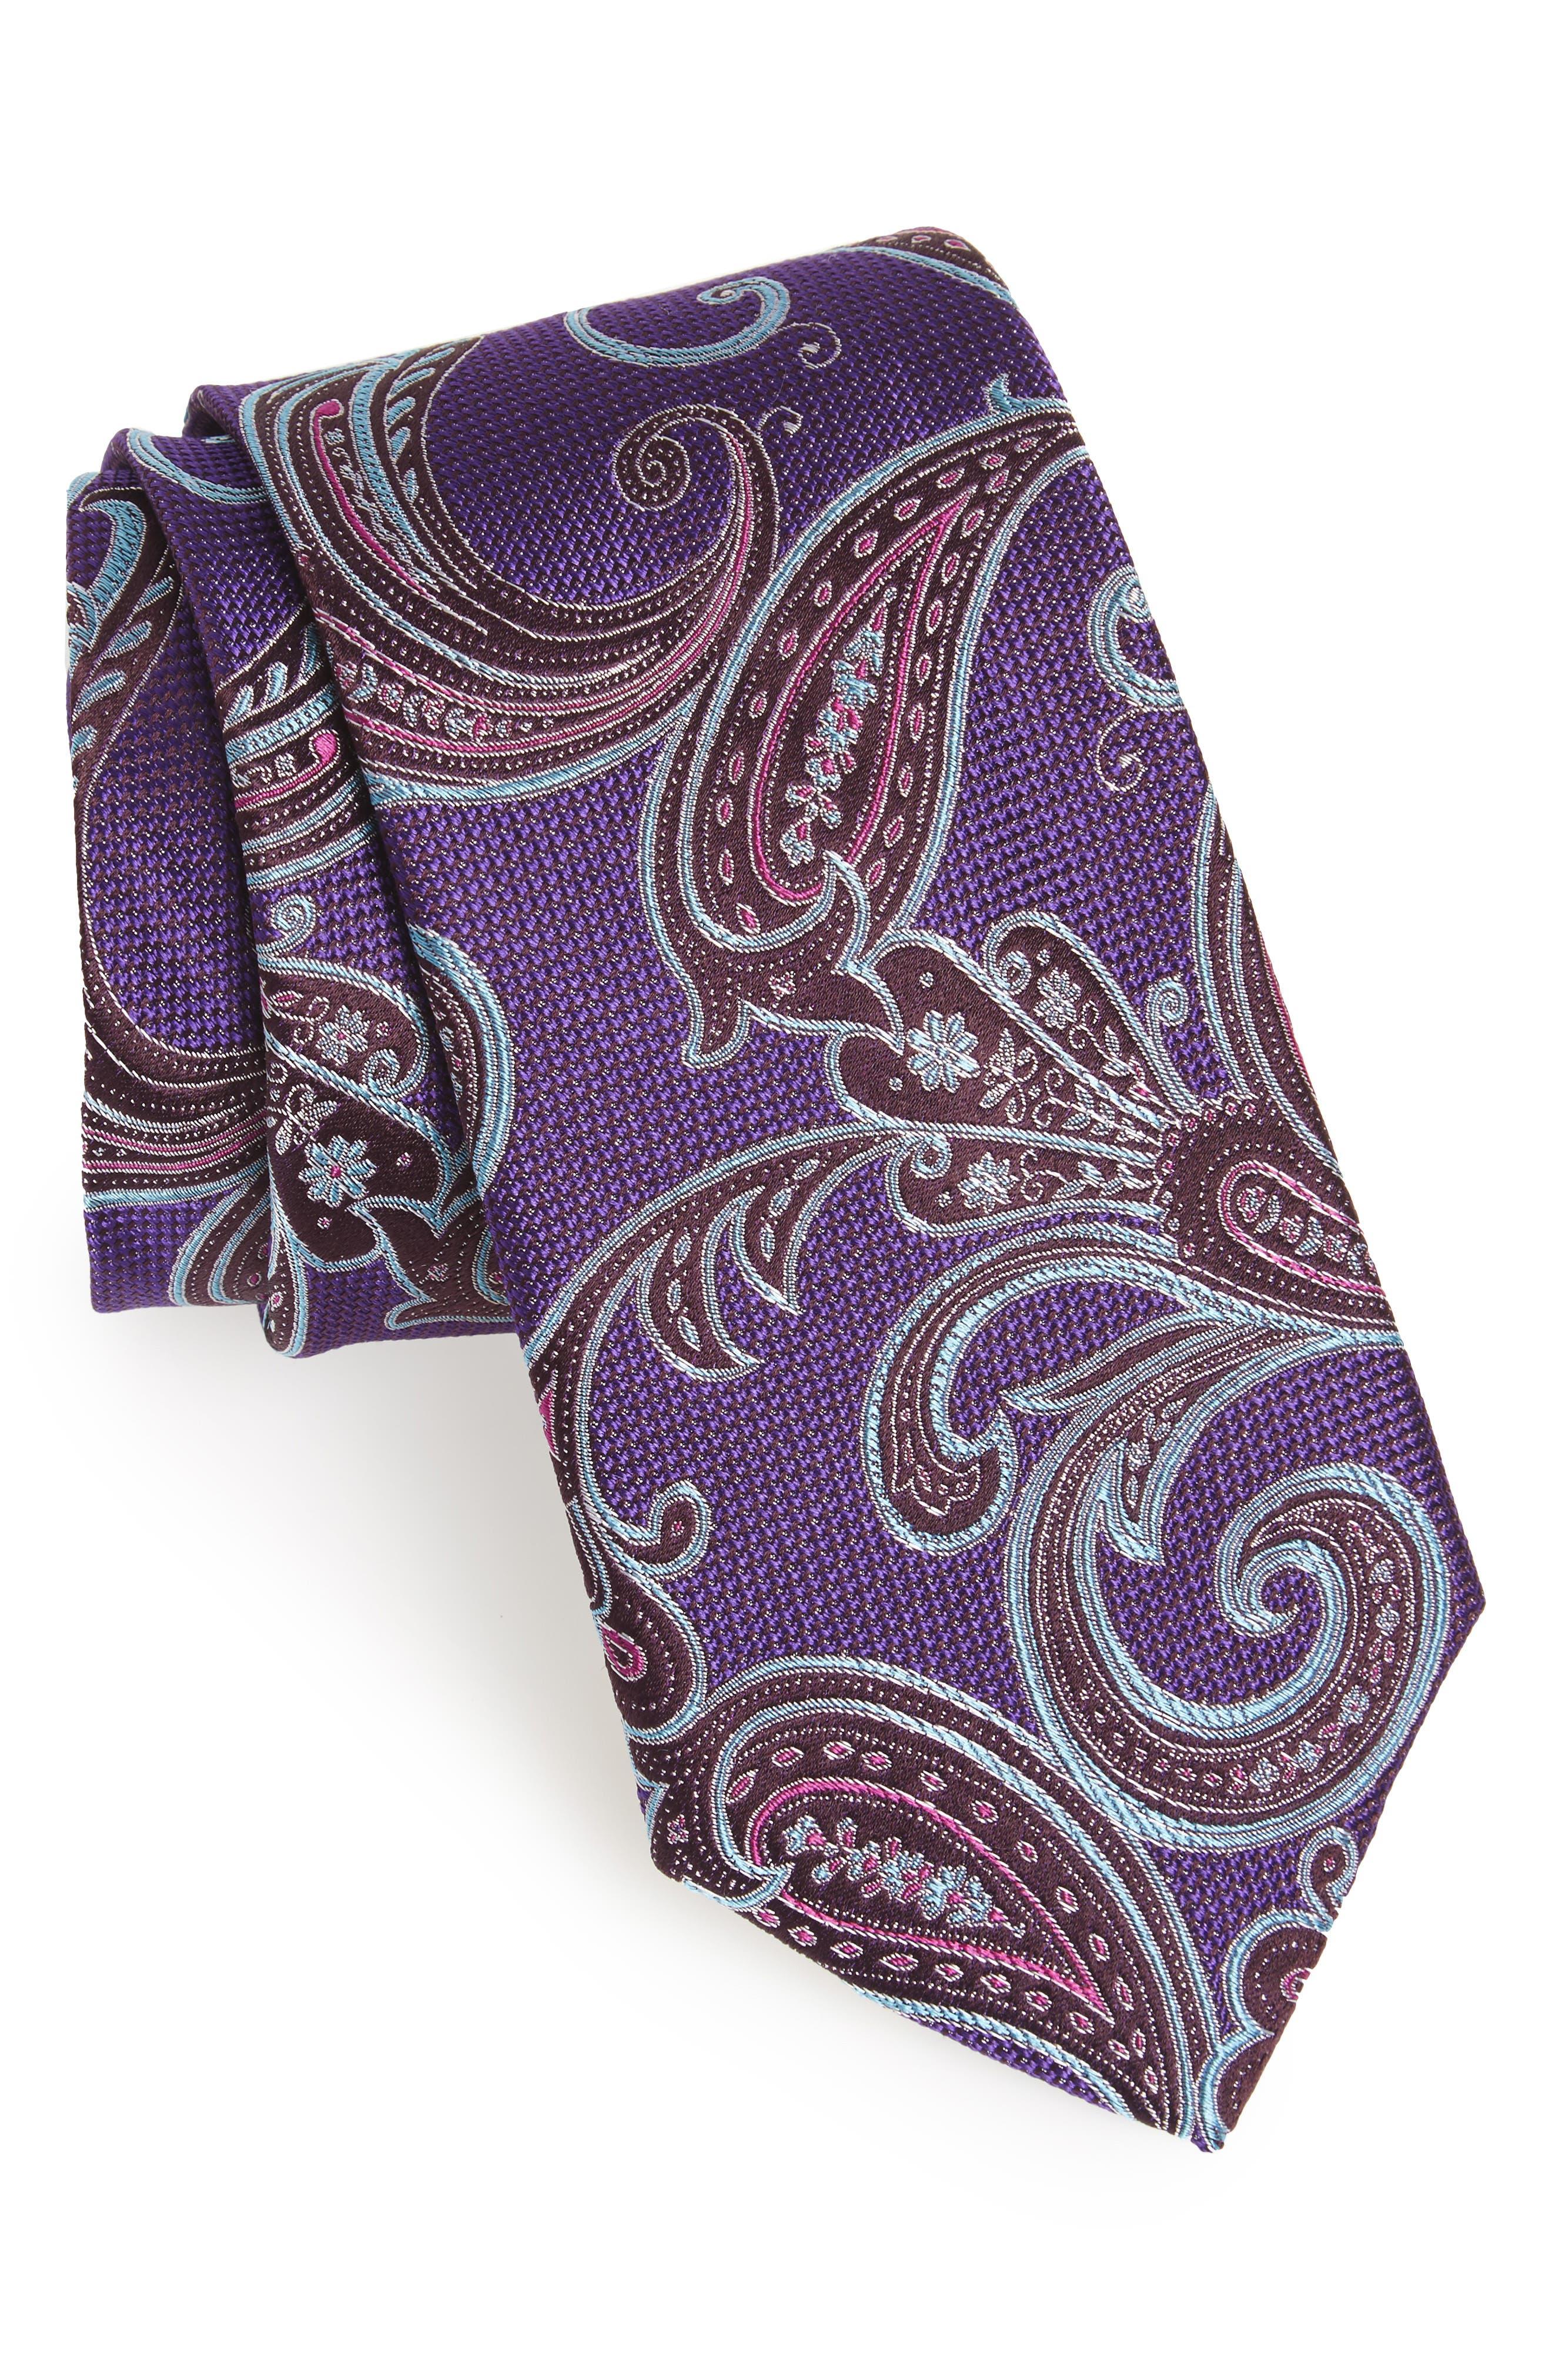 Main Image - Nordstrom Men's Shop Bennett Paisley Silk Tie (X-Long)